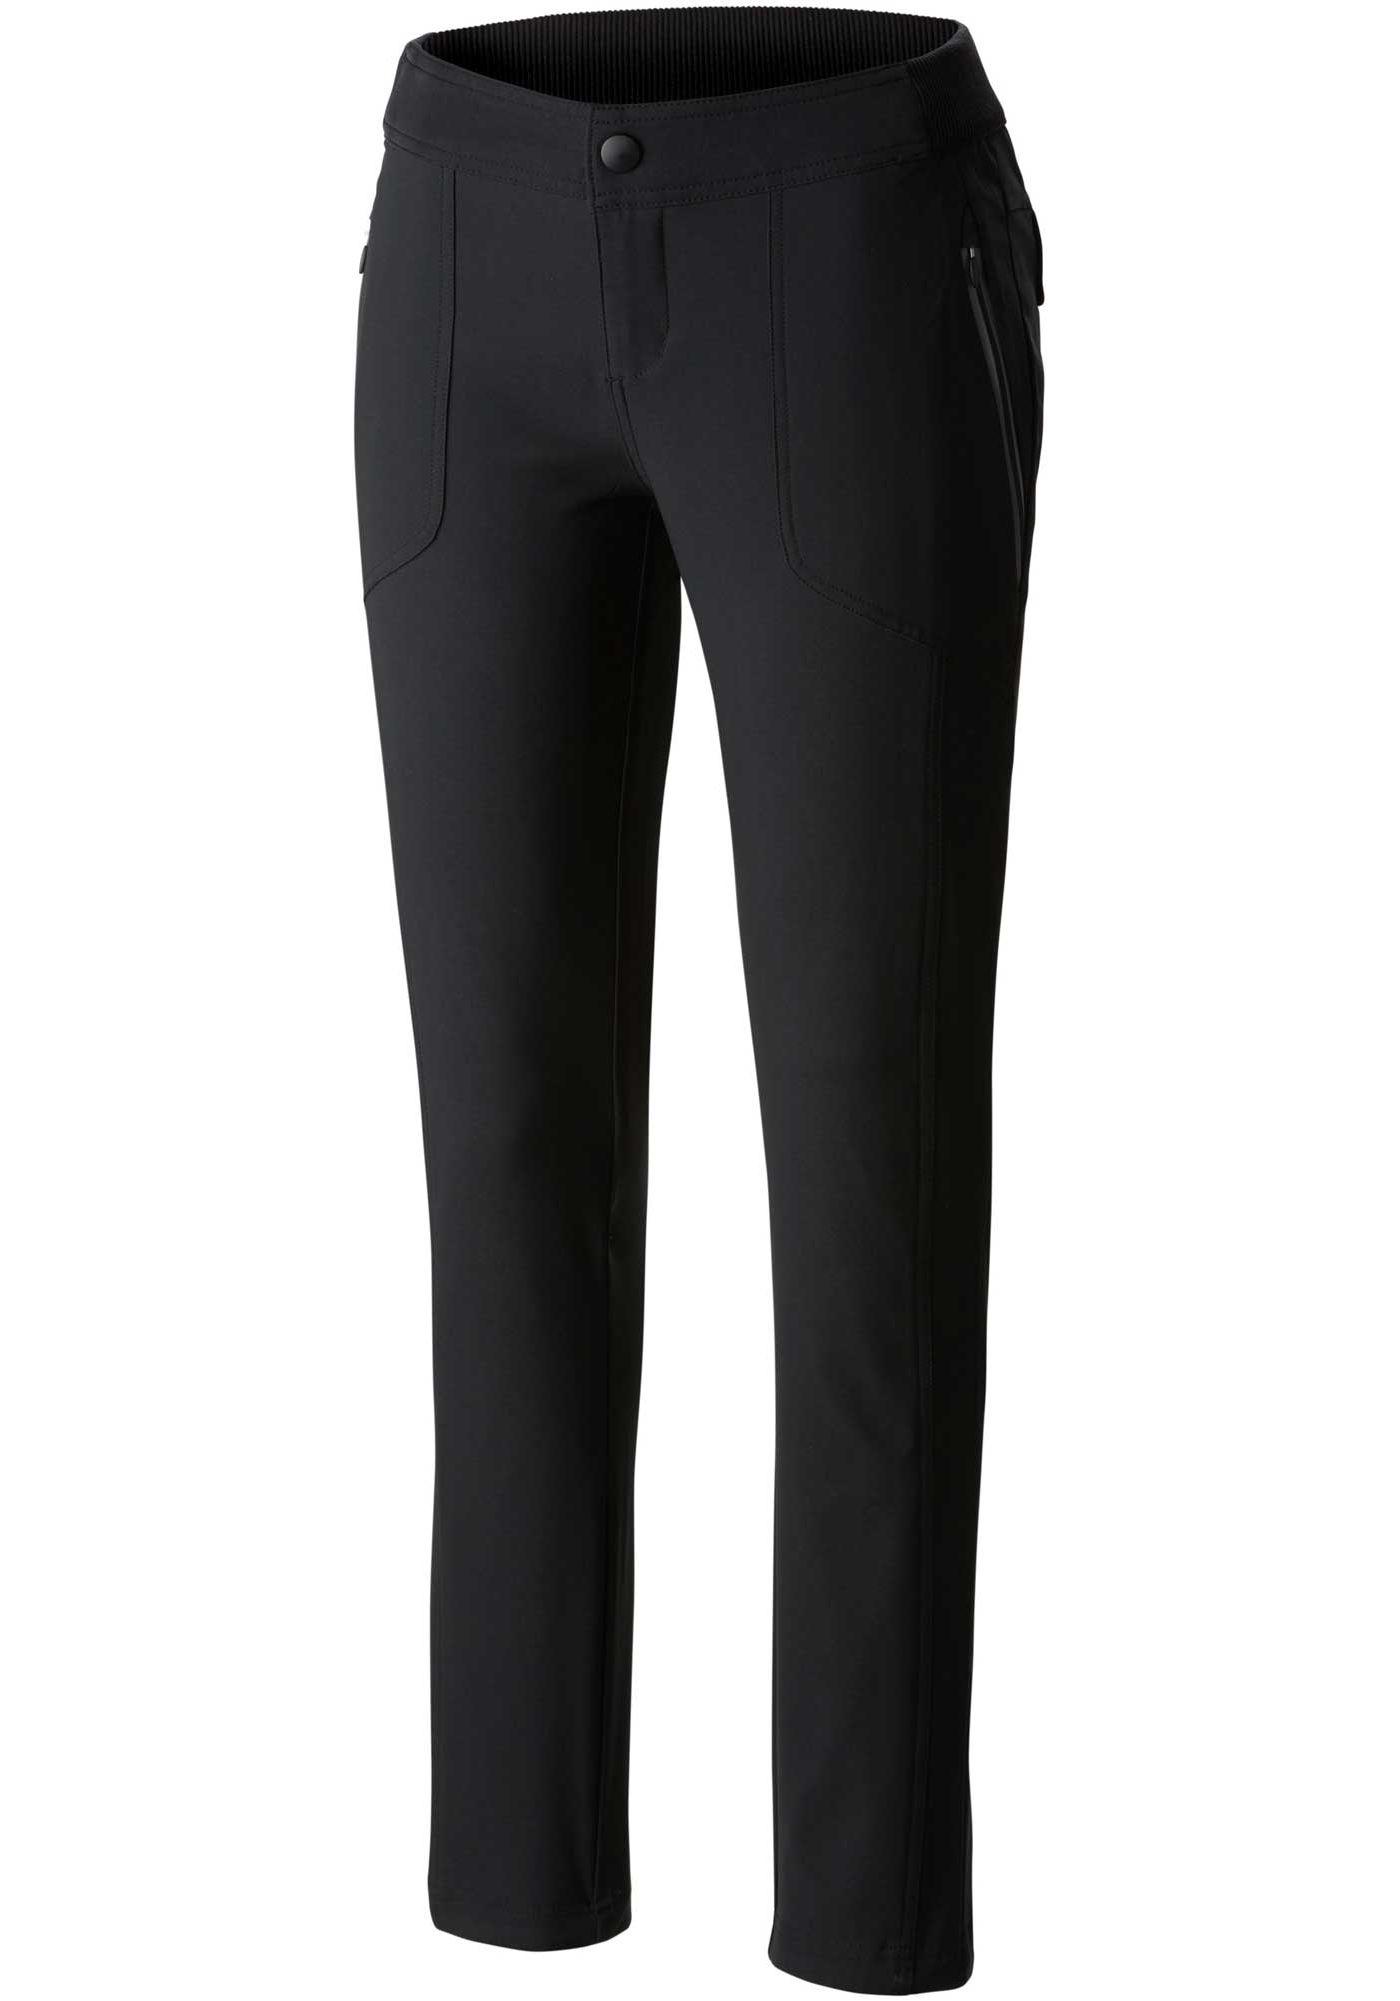 Columbia Women's Bryce Canyon Pants